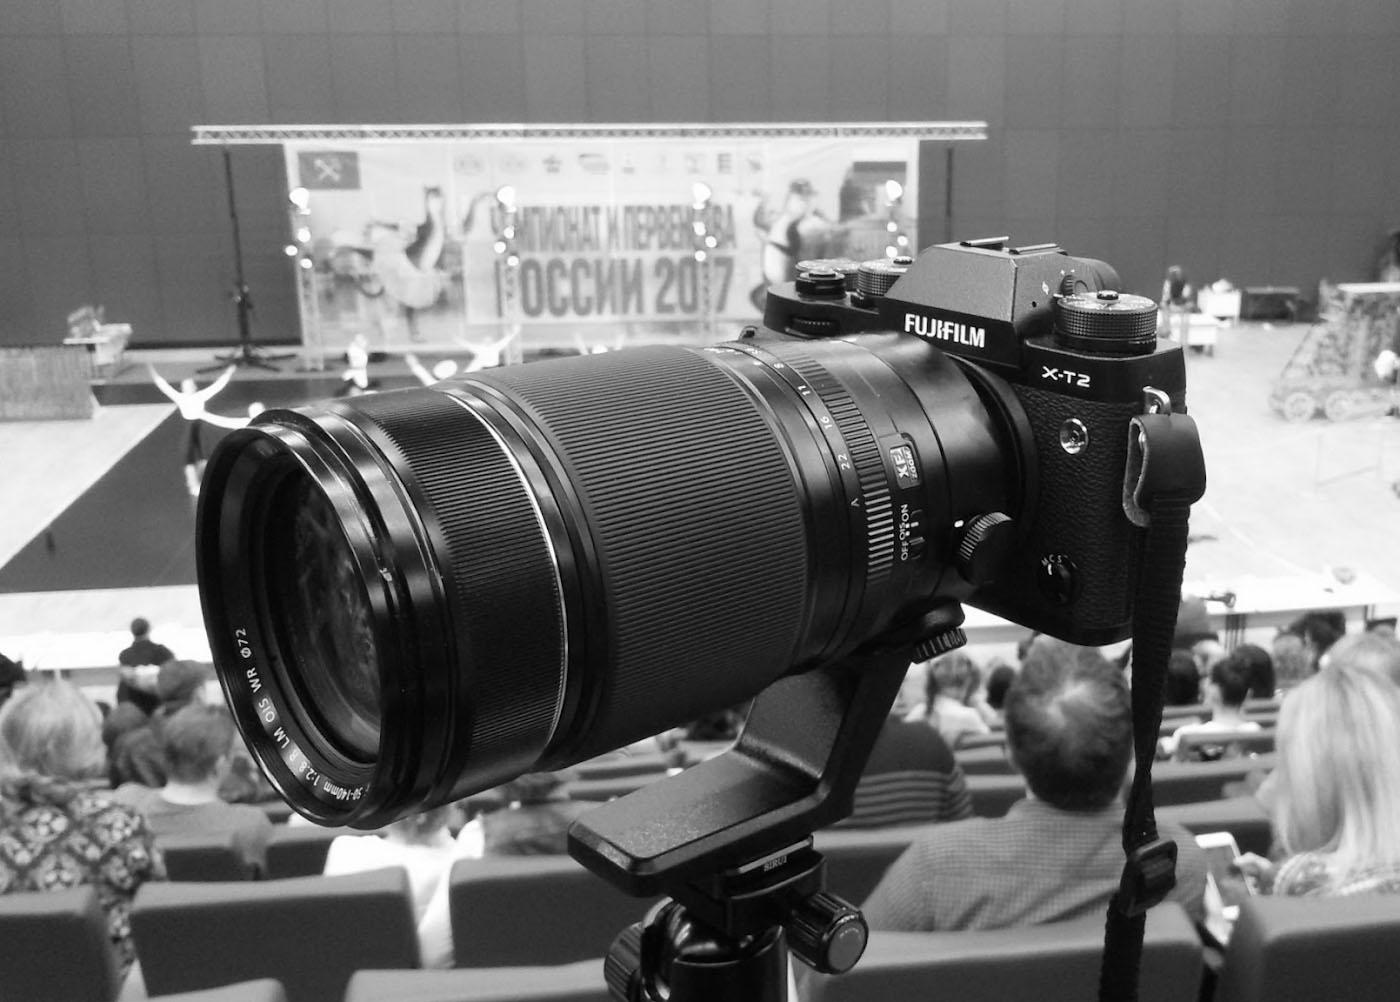 1. Камера Fujifilm X-T2 с телеобъективом Fujifilm XF 50-140mm f/2.8. Обзор и примеры фотографий.